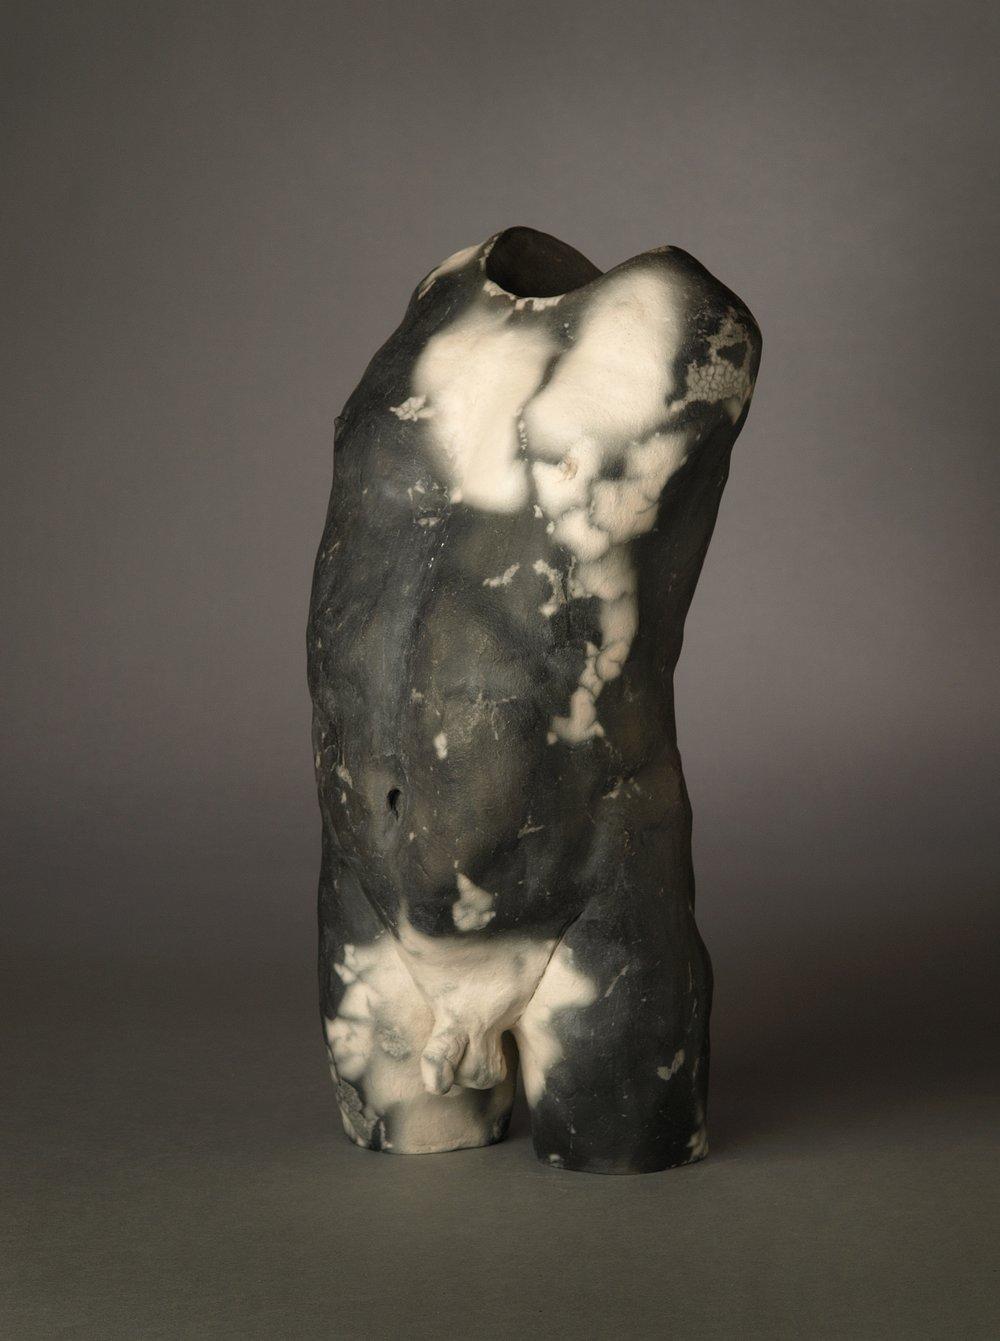 "Self-Confidence   Chris Corson  Raku-fired Ceramic  15"" x 6"" x 6""  $2,000   Click here to Inquire"